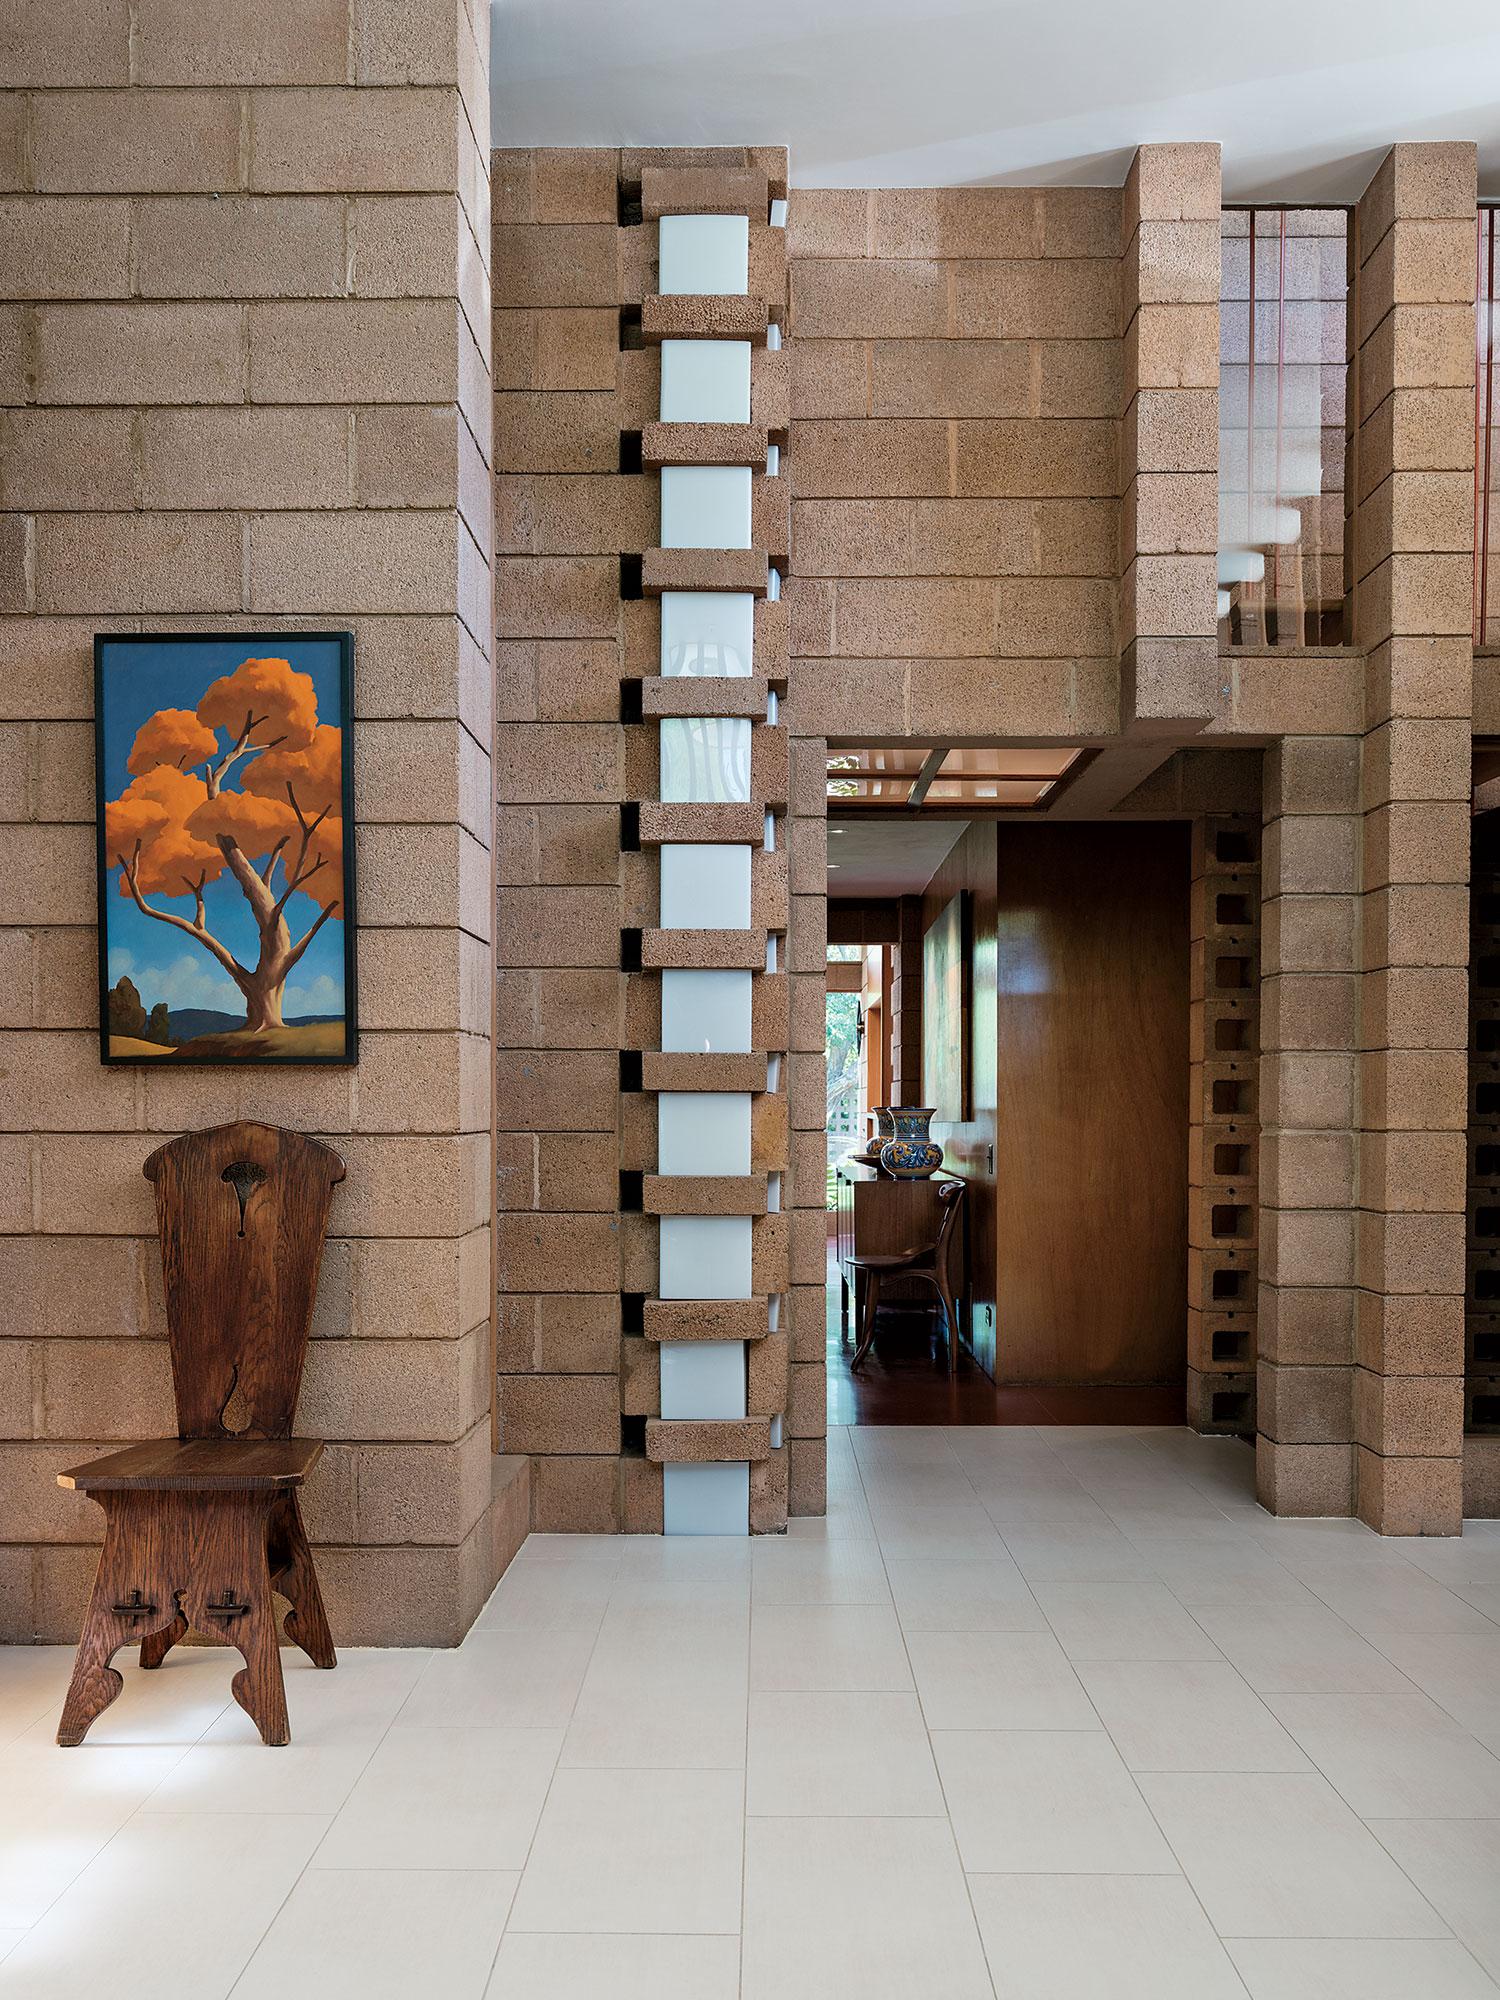 Preserving A Taliesin Legacy - Phoenix Home & Garden